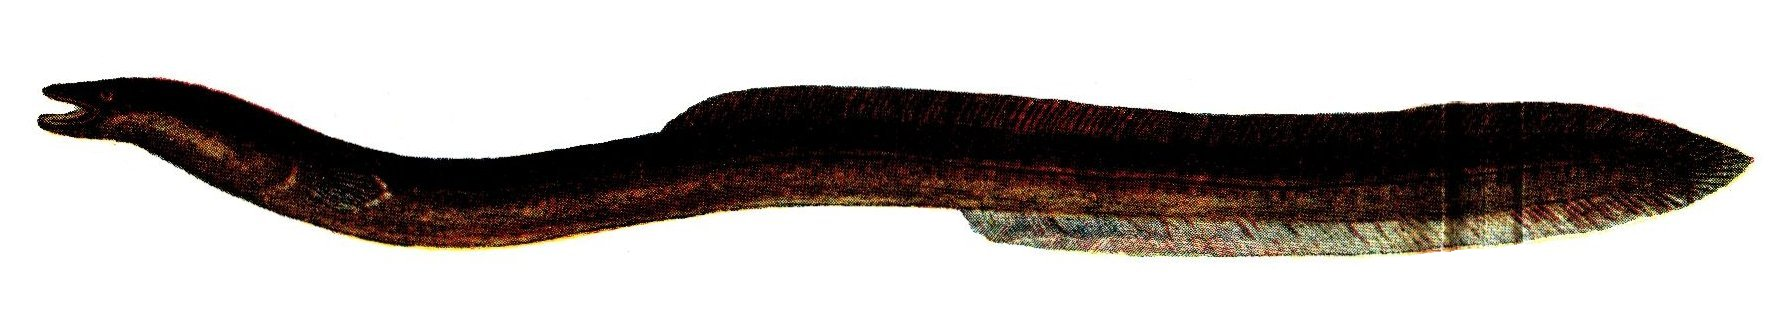 Deep sea eel wallpaper